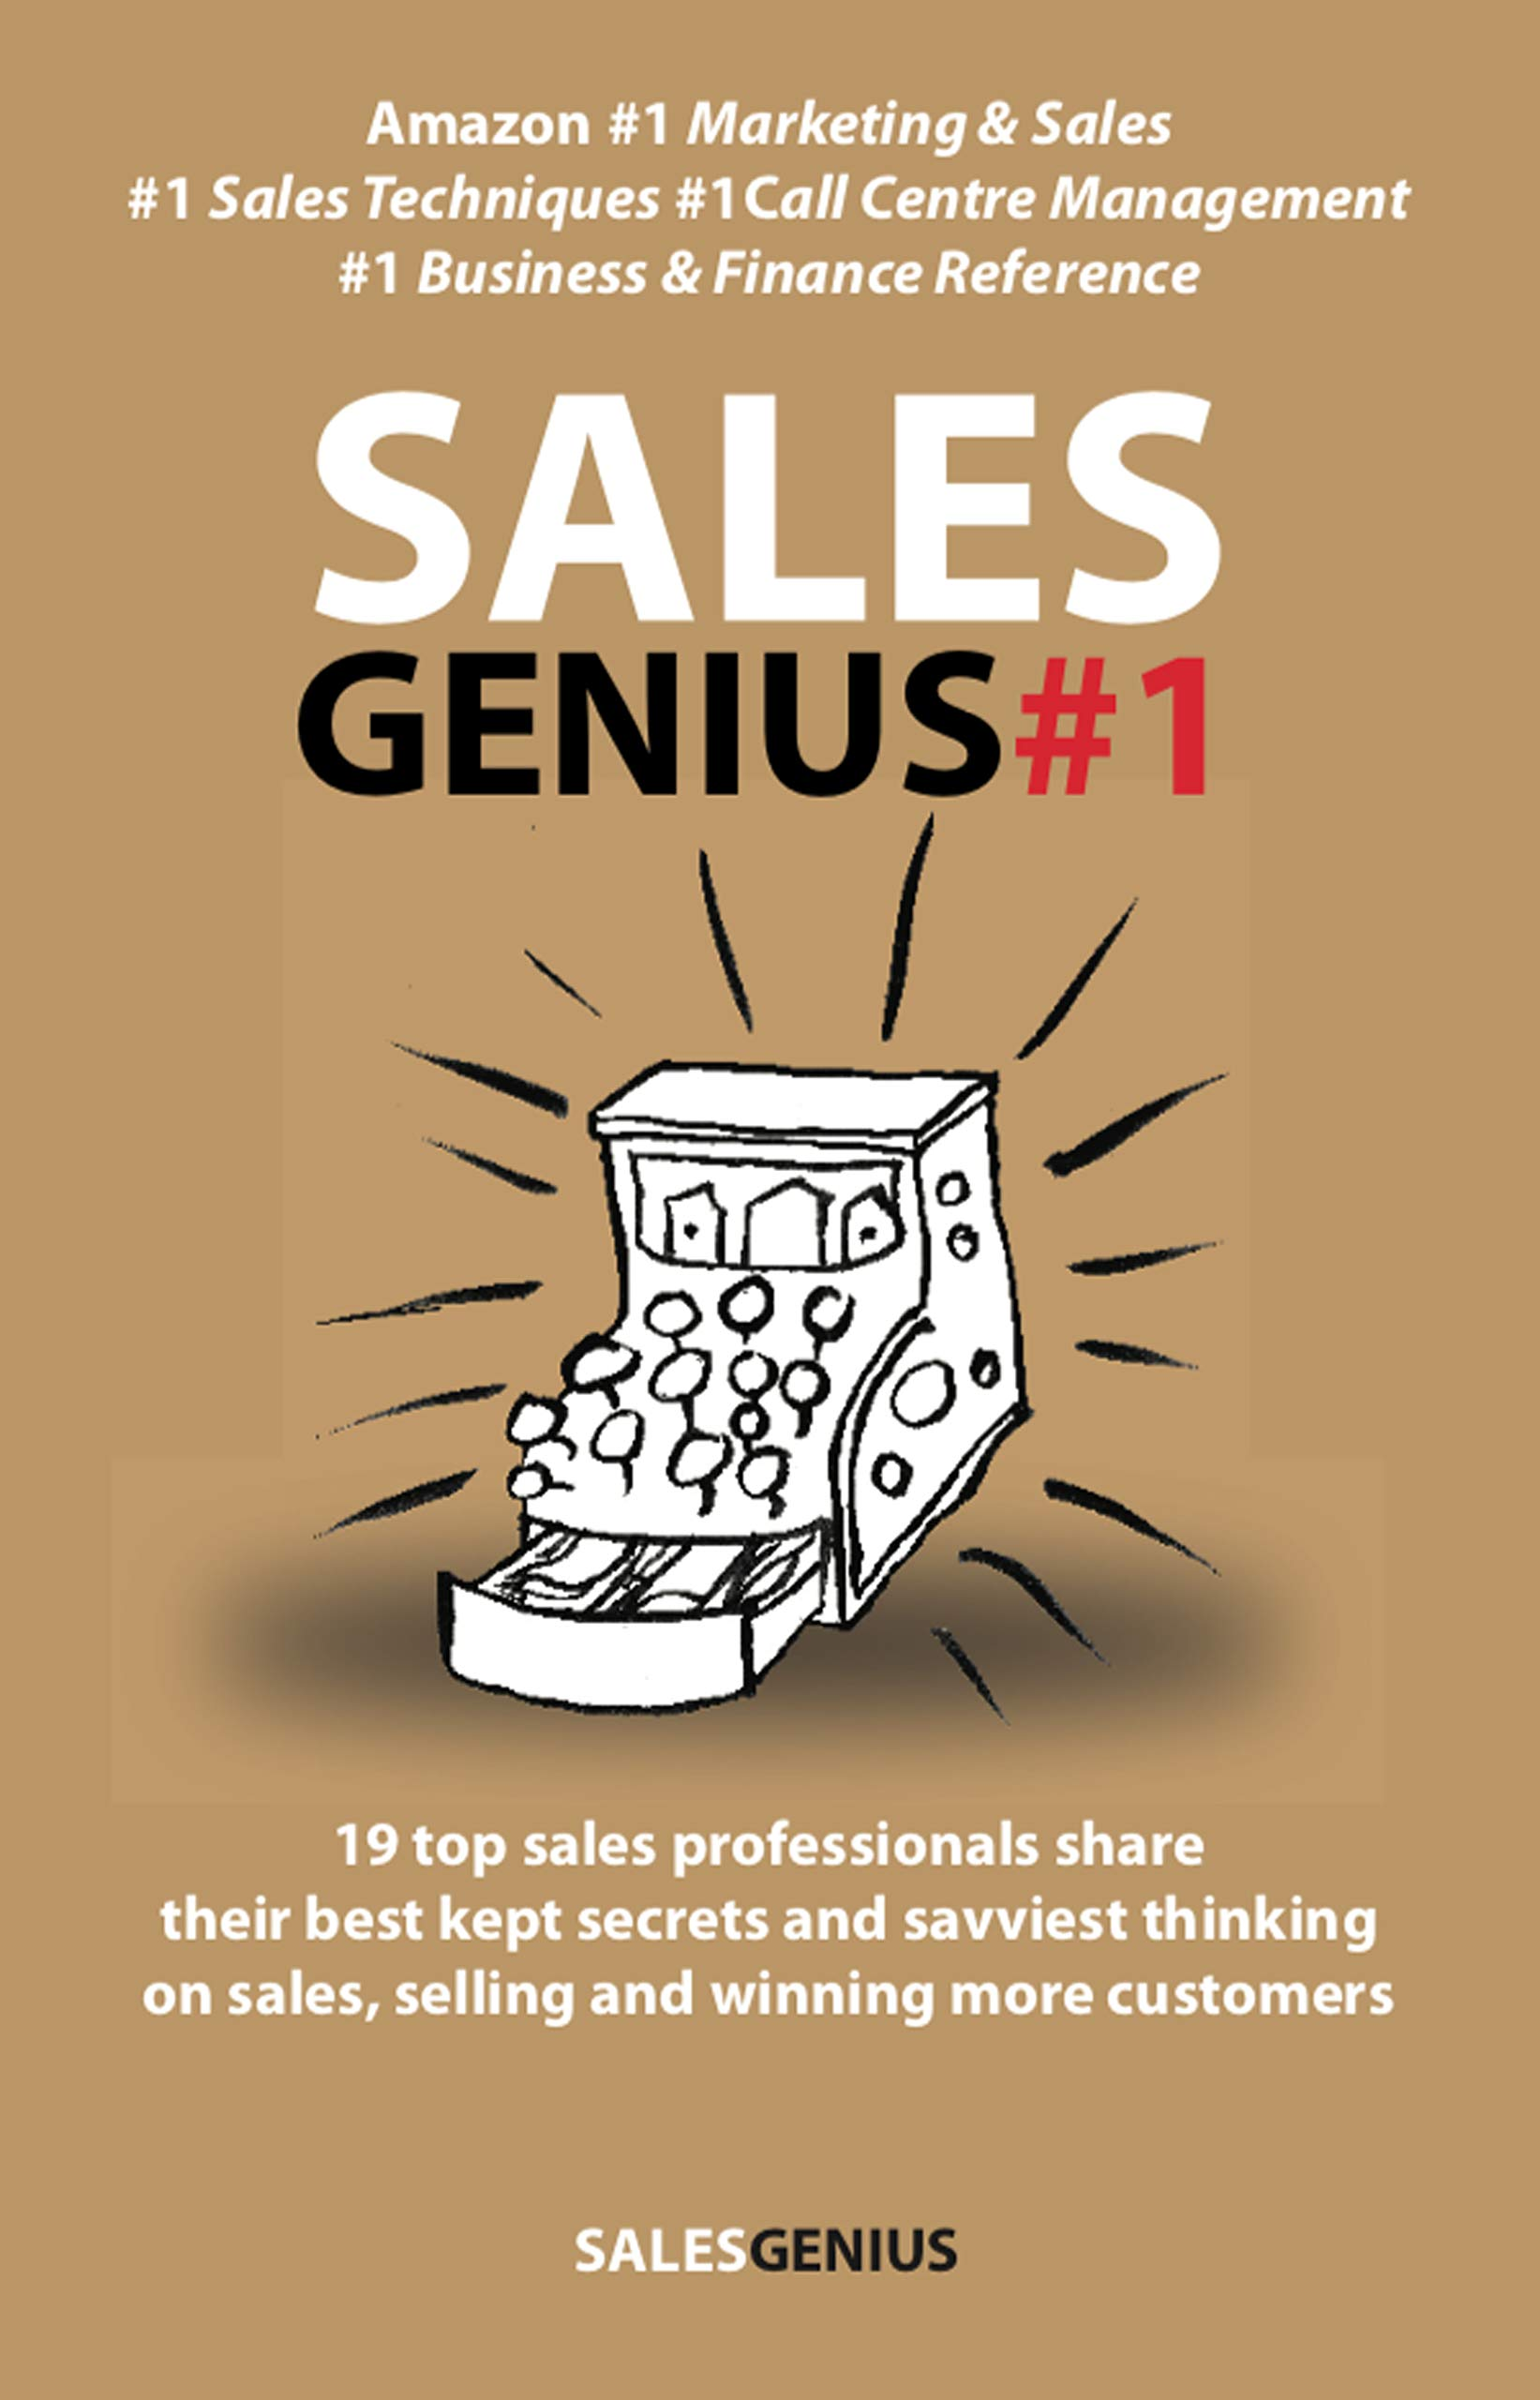 Sales Genius 1: 19 top sales professionals share their sales secrets